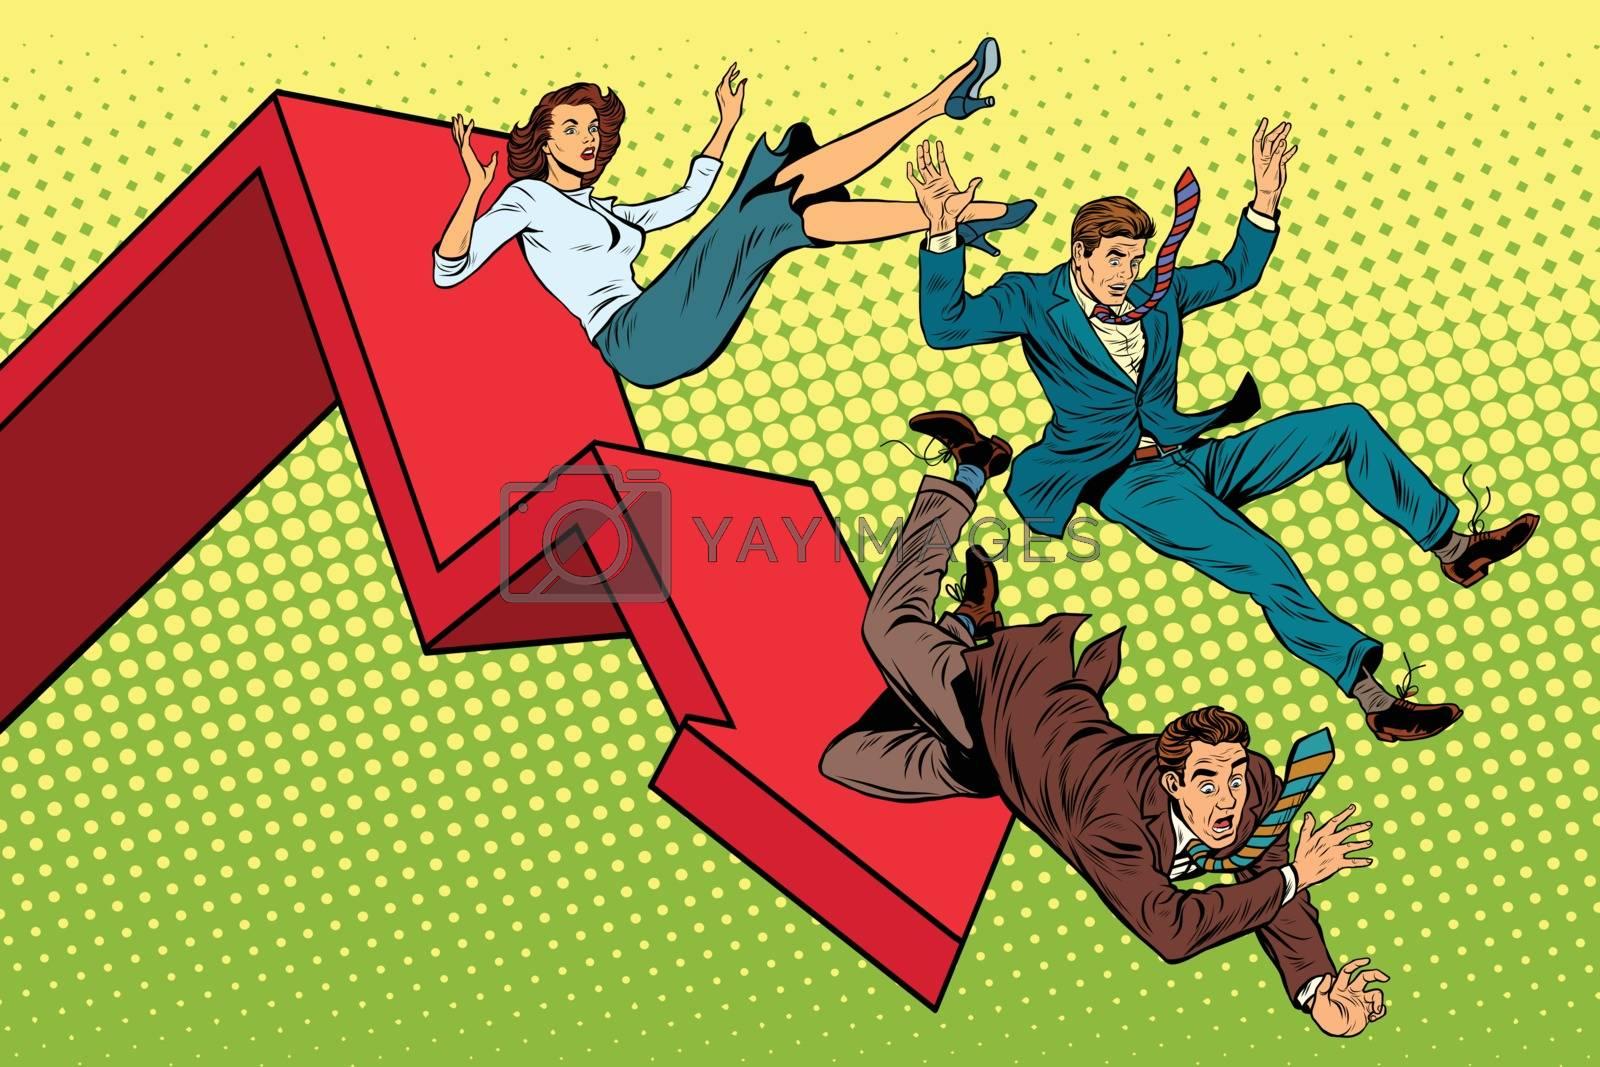 Business men and woman financial collapse pop art retro vector illustration